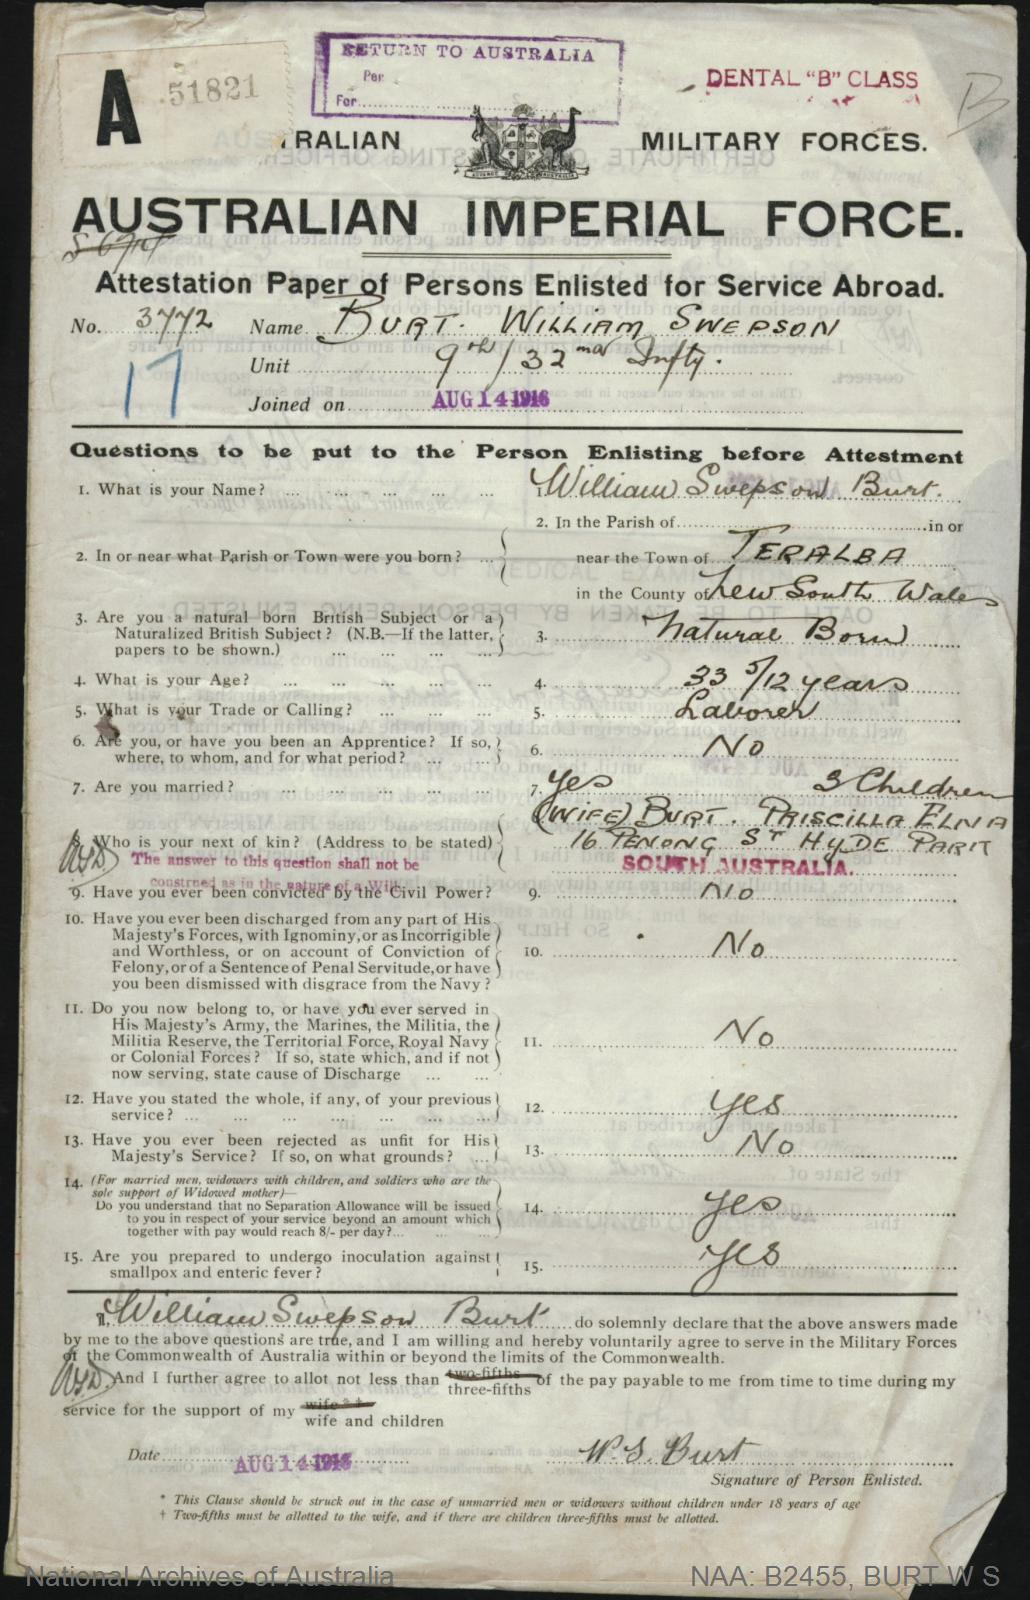 Burt William Swepson : SERN 3772 : POB Teralba NSW : POE Adelaide SA : NOK W Burt Priscilla Elna